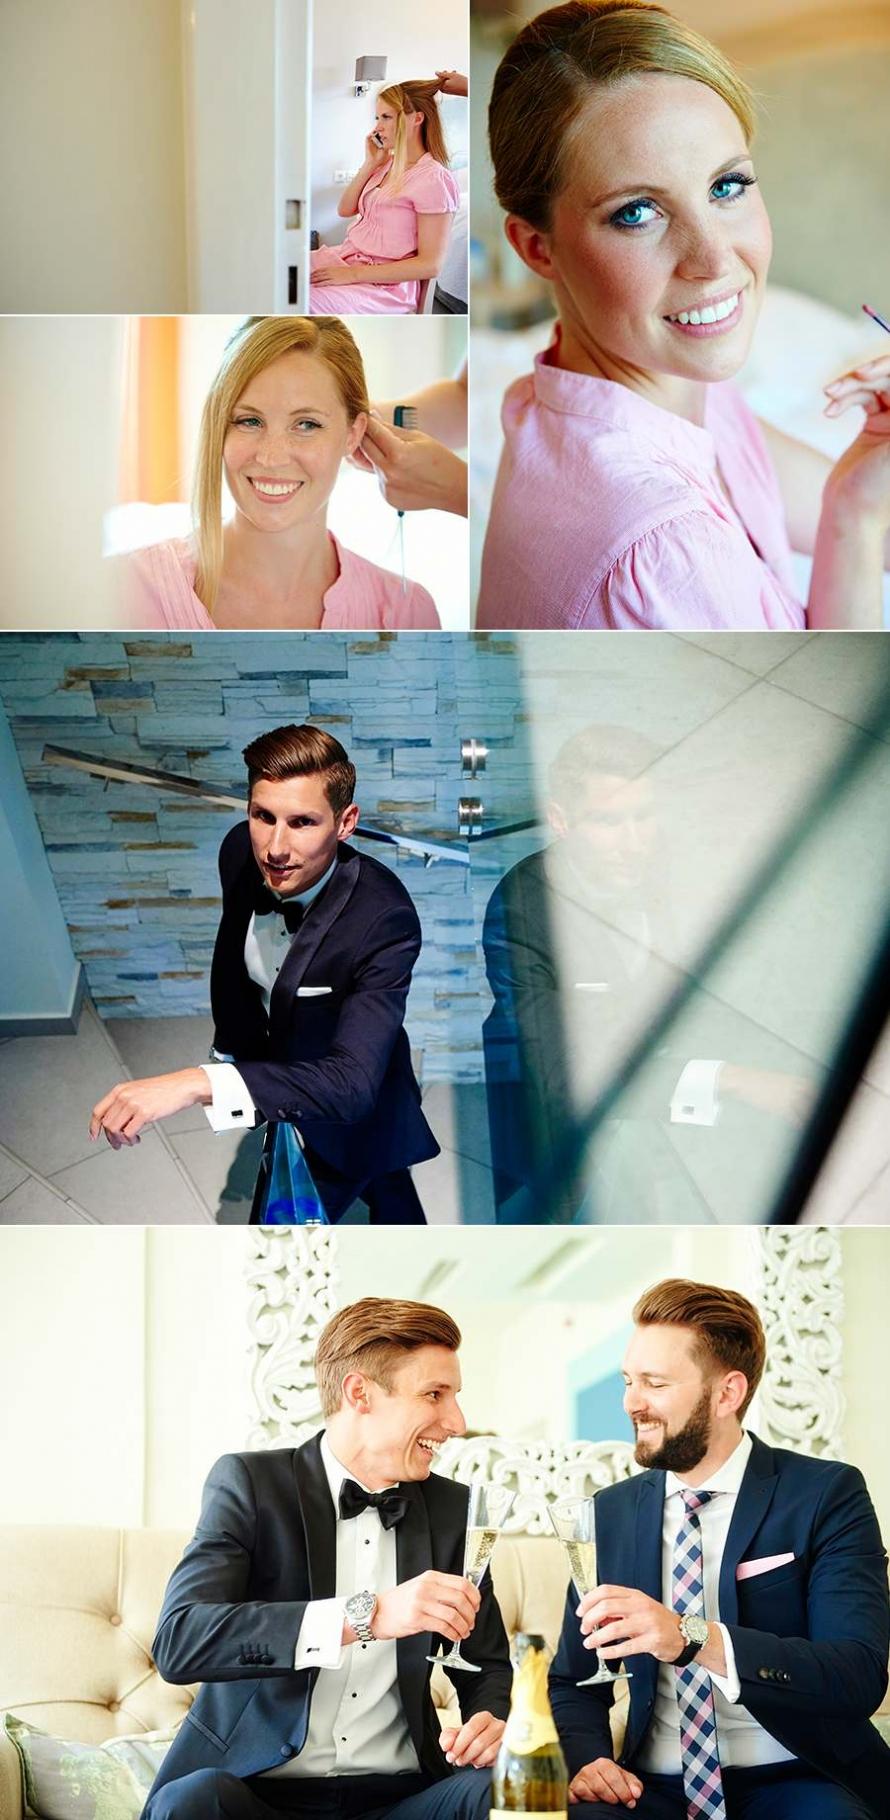 Tobi & Vanessa wedding photos 03